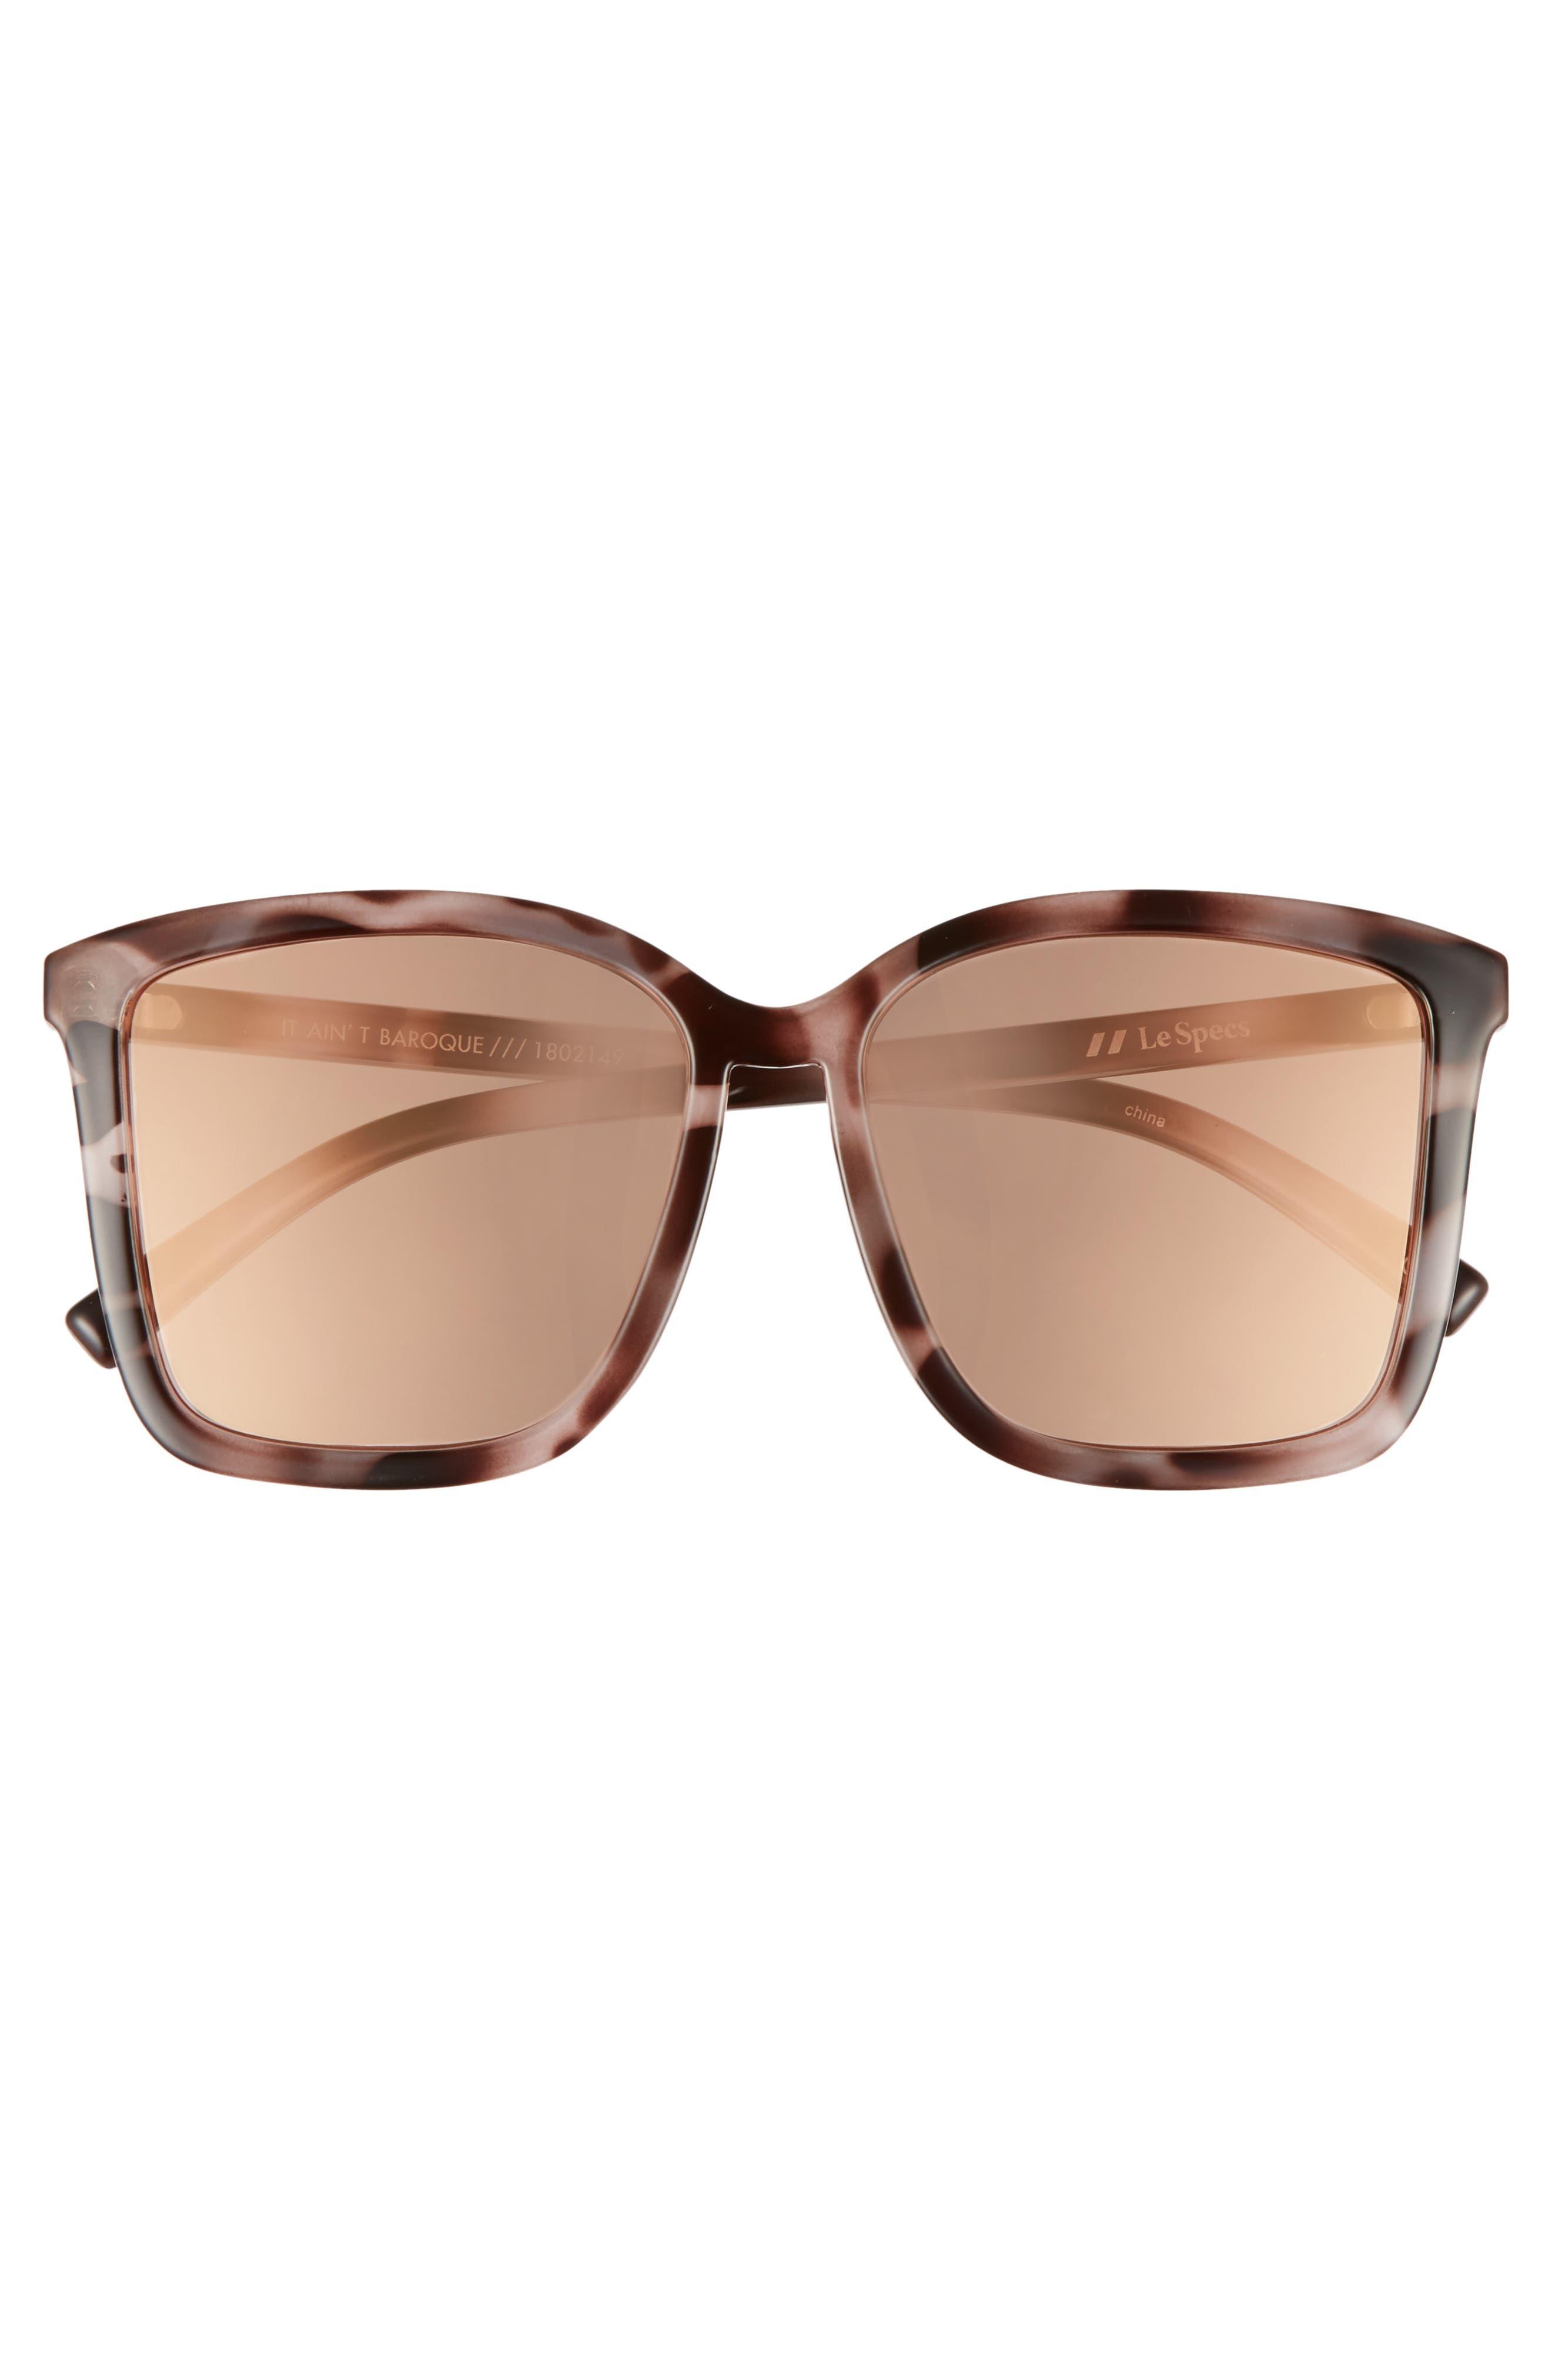 It Ain't Baroque 55mm Sunglasses,                             Alternate thumbnail 3, color,                             APRICOT TORT